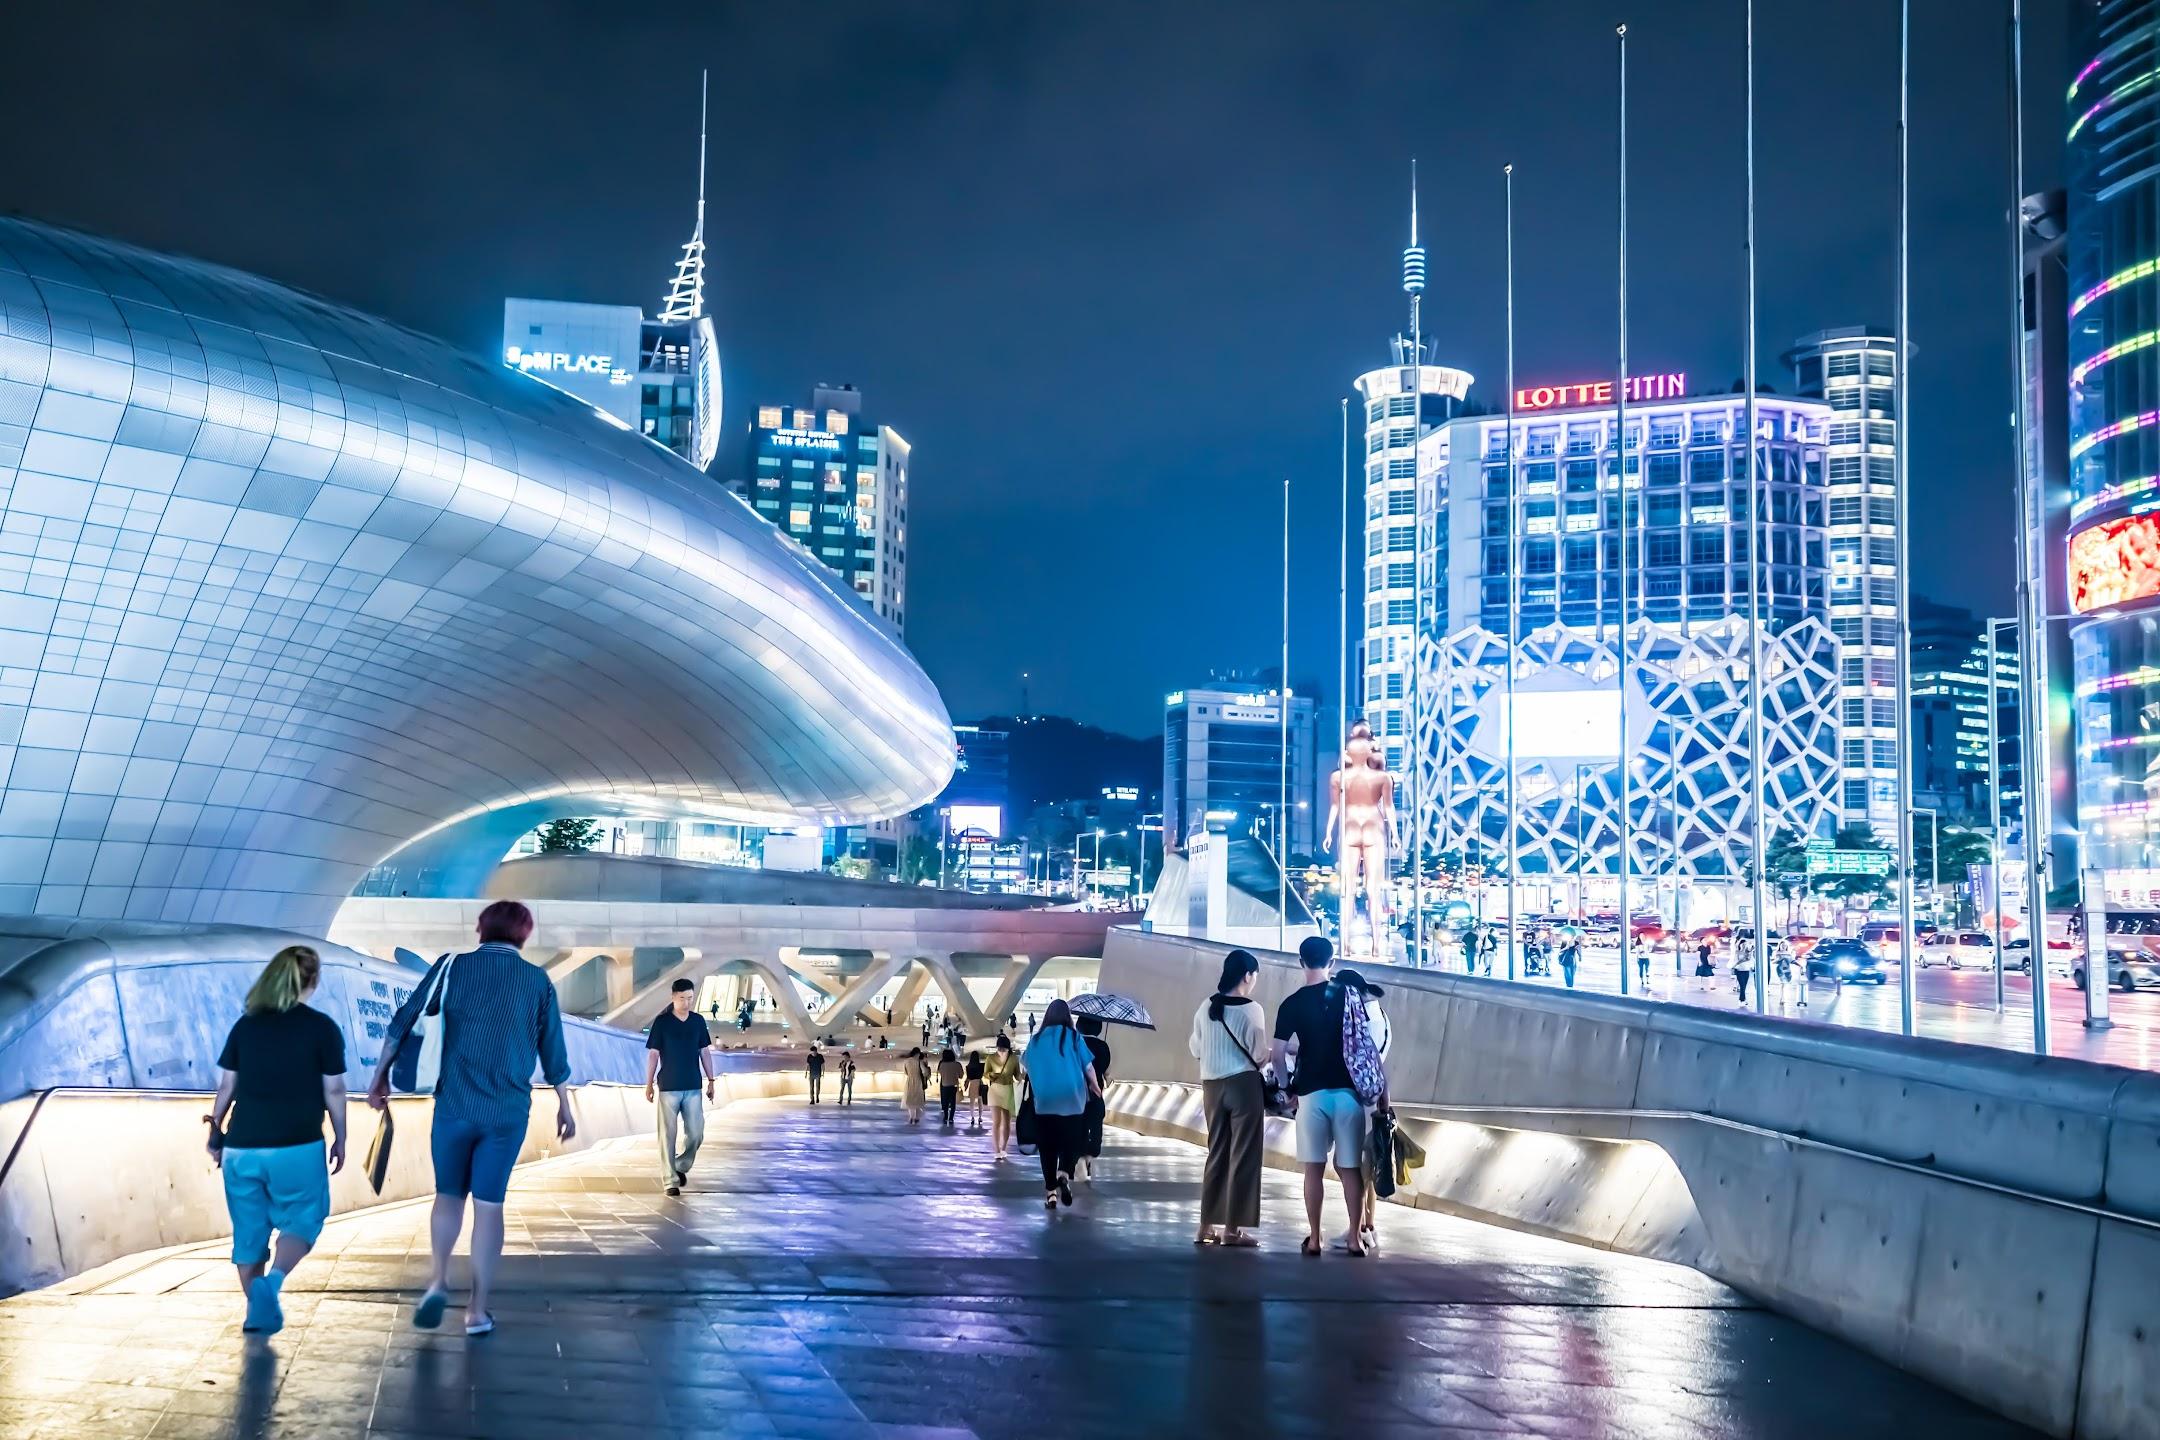 Seoul Dongdaemun Design Plaza (DDP)6